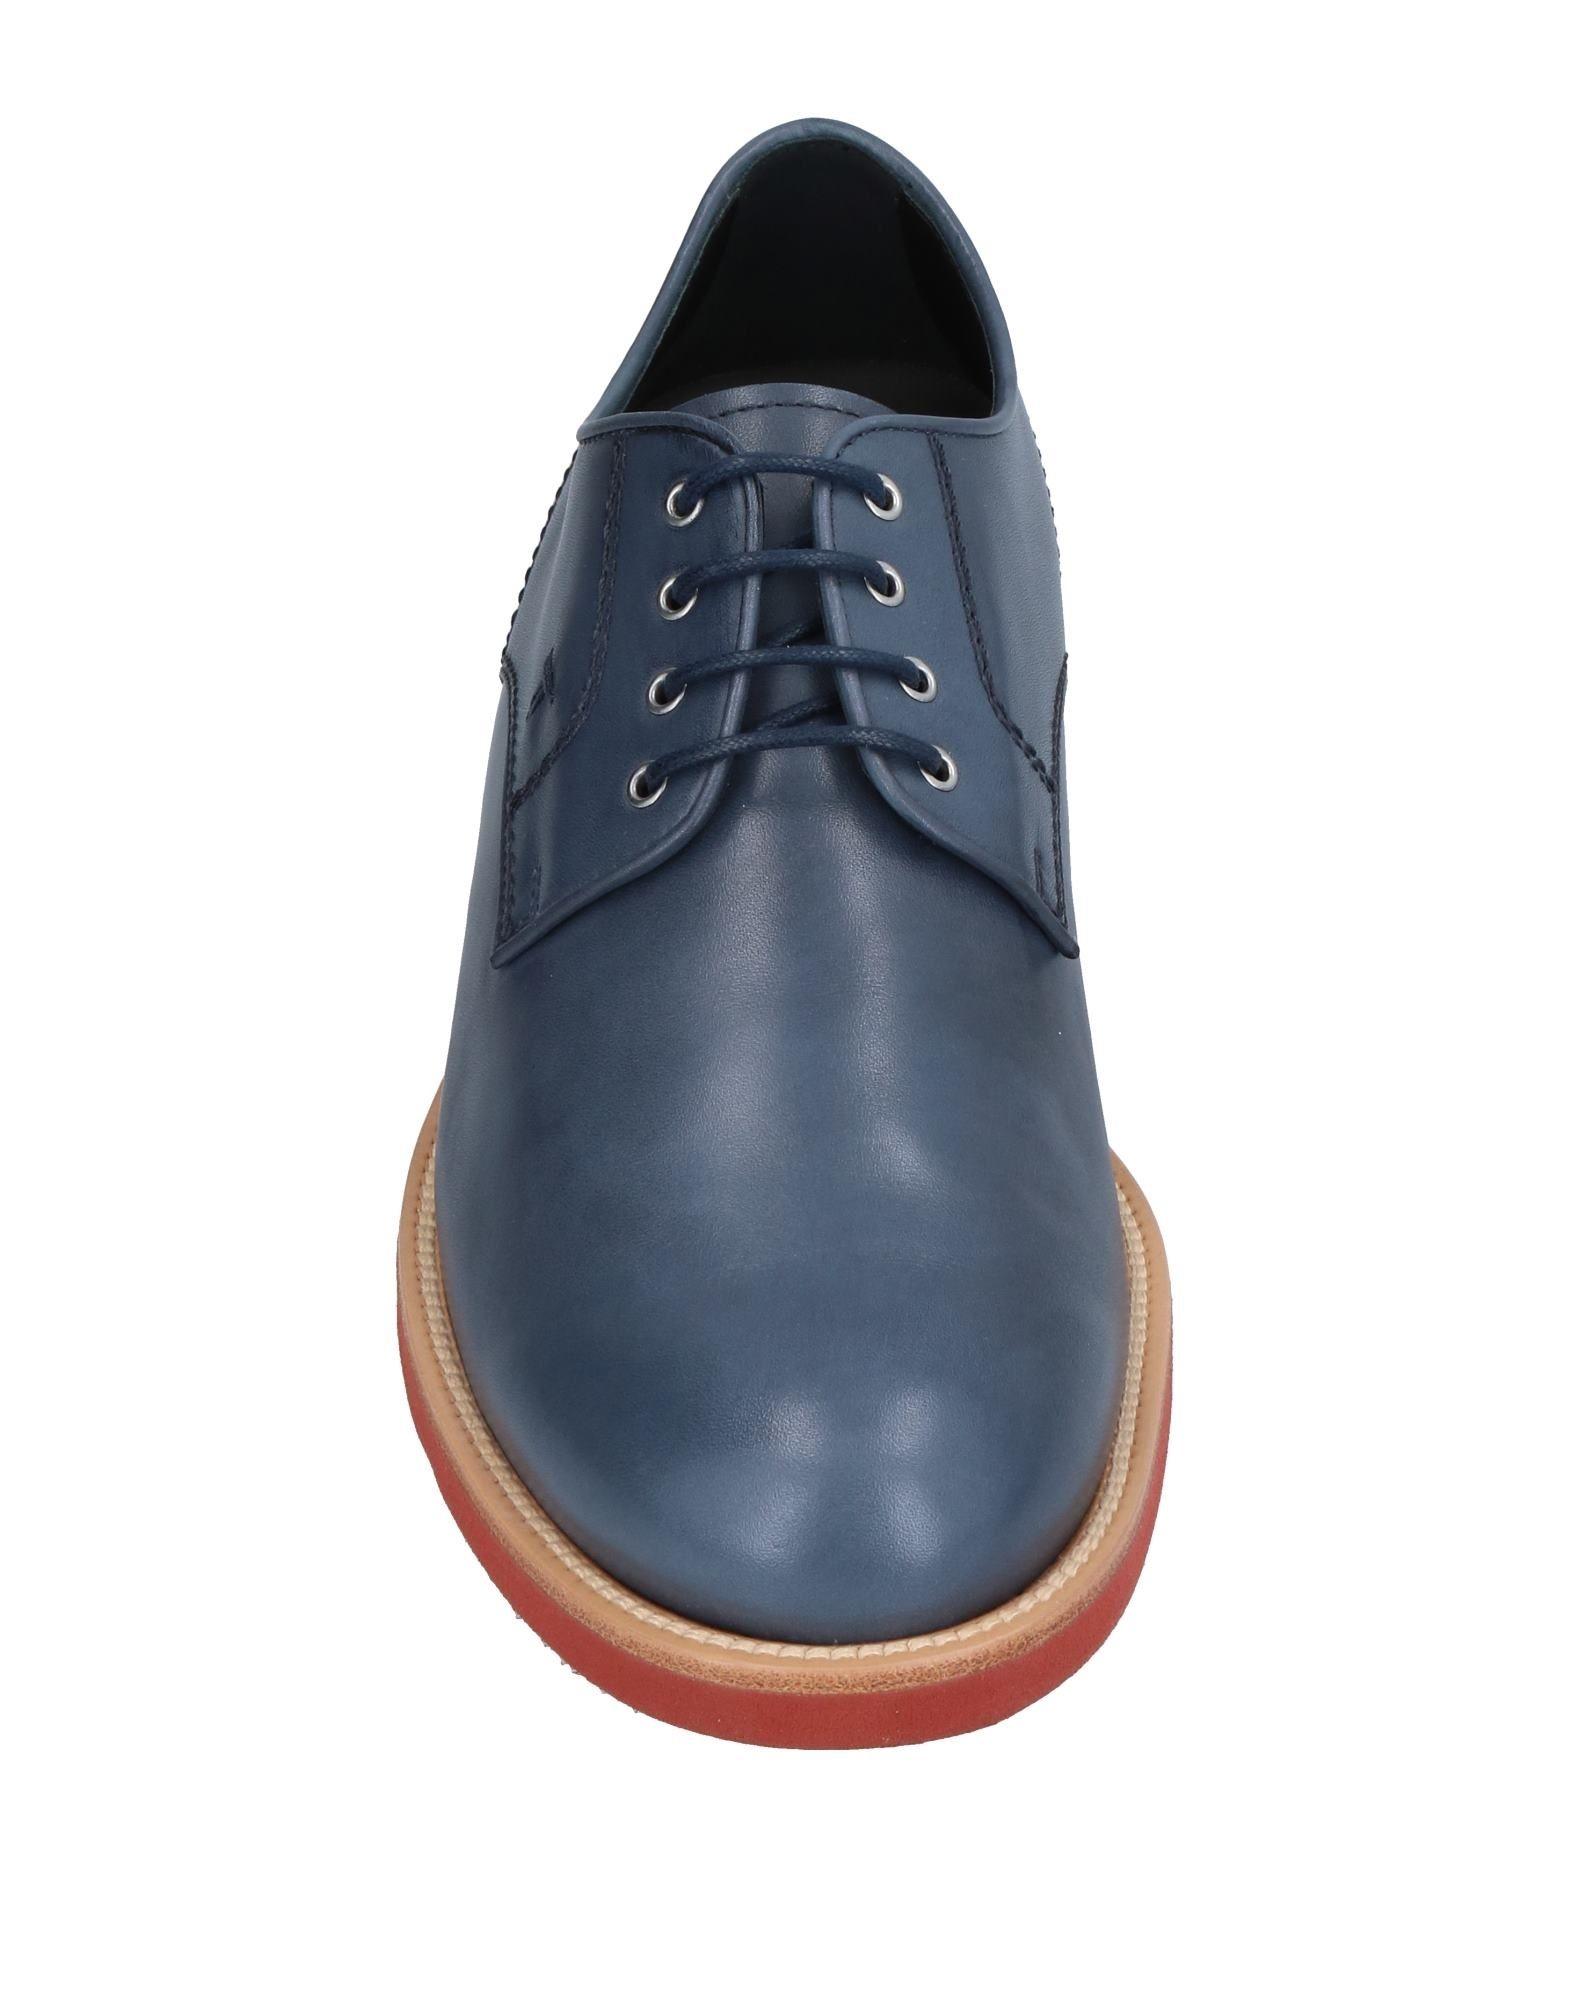 Hogan Schnürschuhe Herren  11398931HJ Gute Qualität beliebte Schuhe